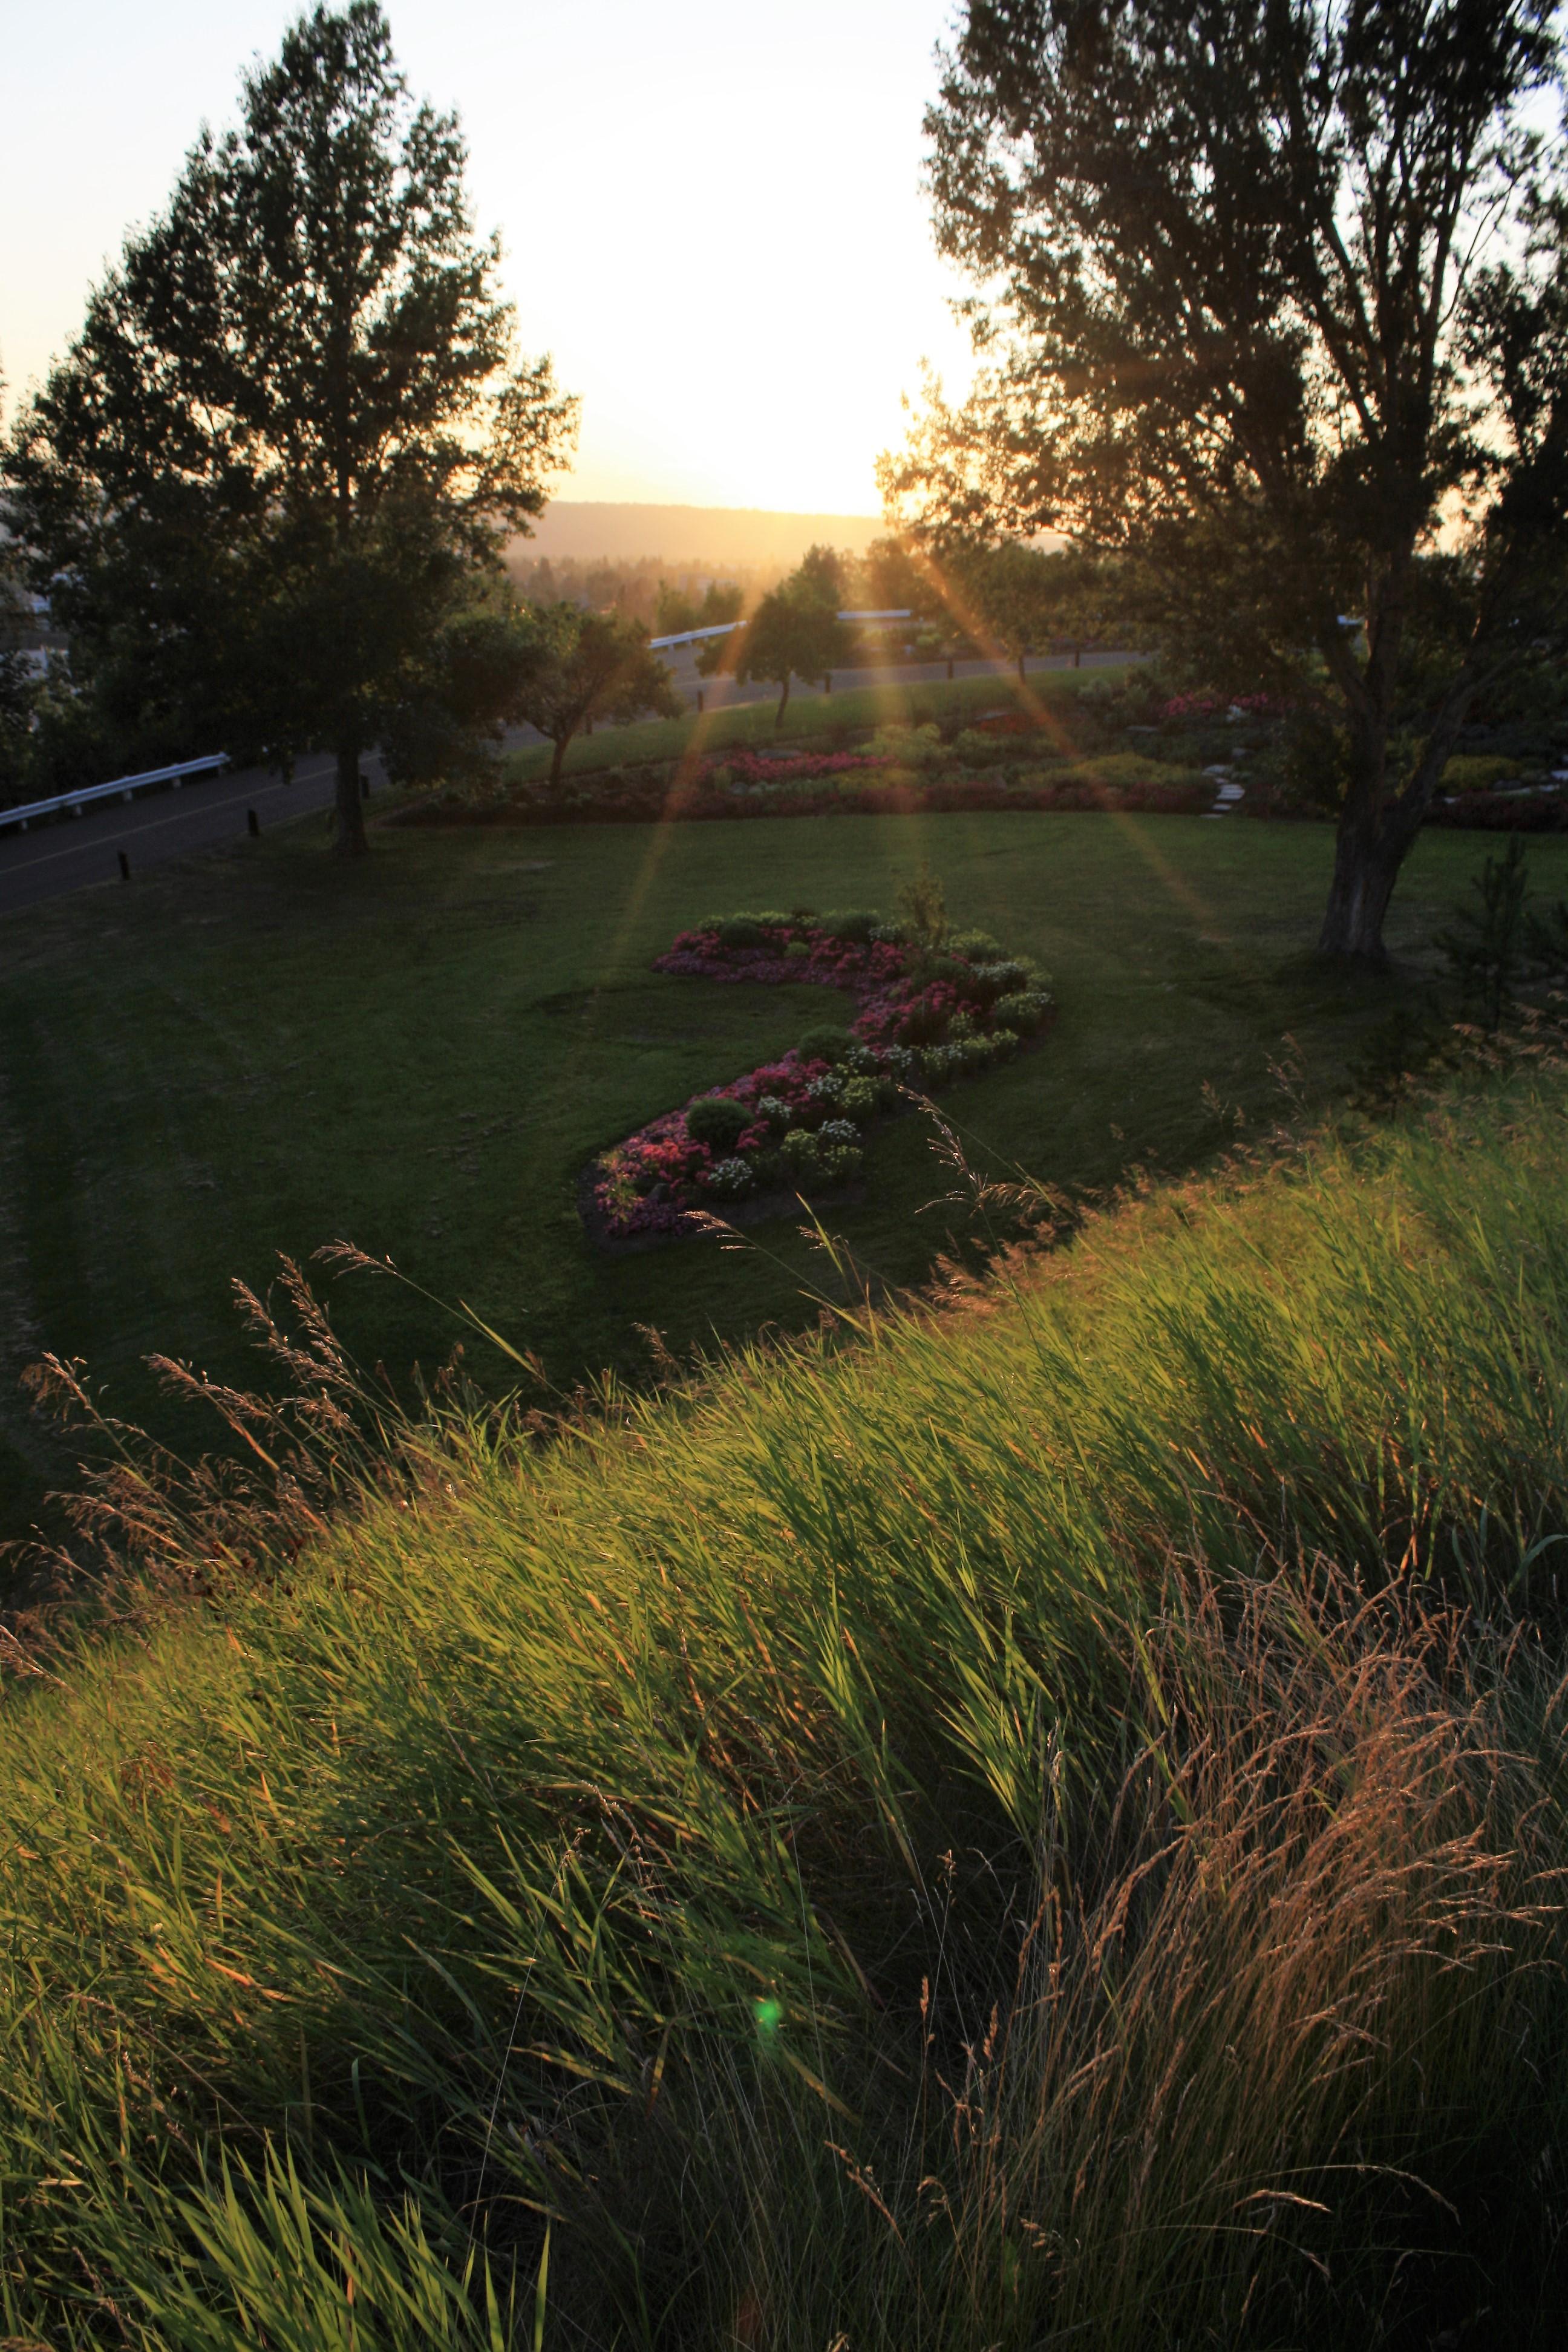 DM_nature_sunsetssunrises_550